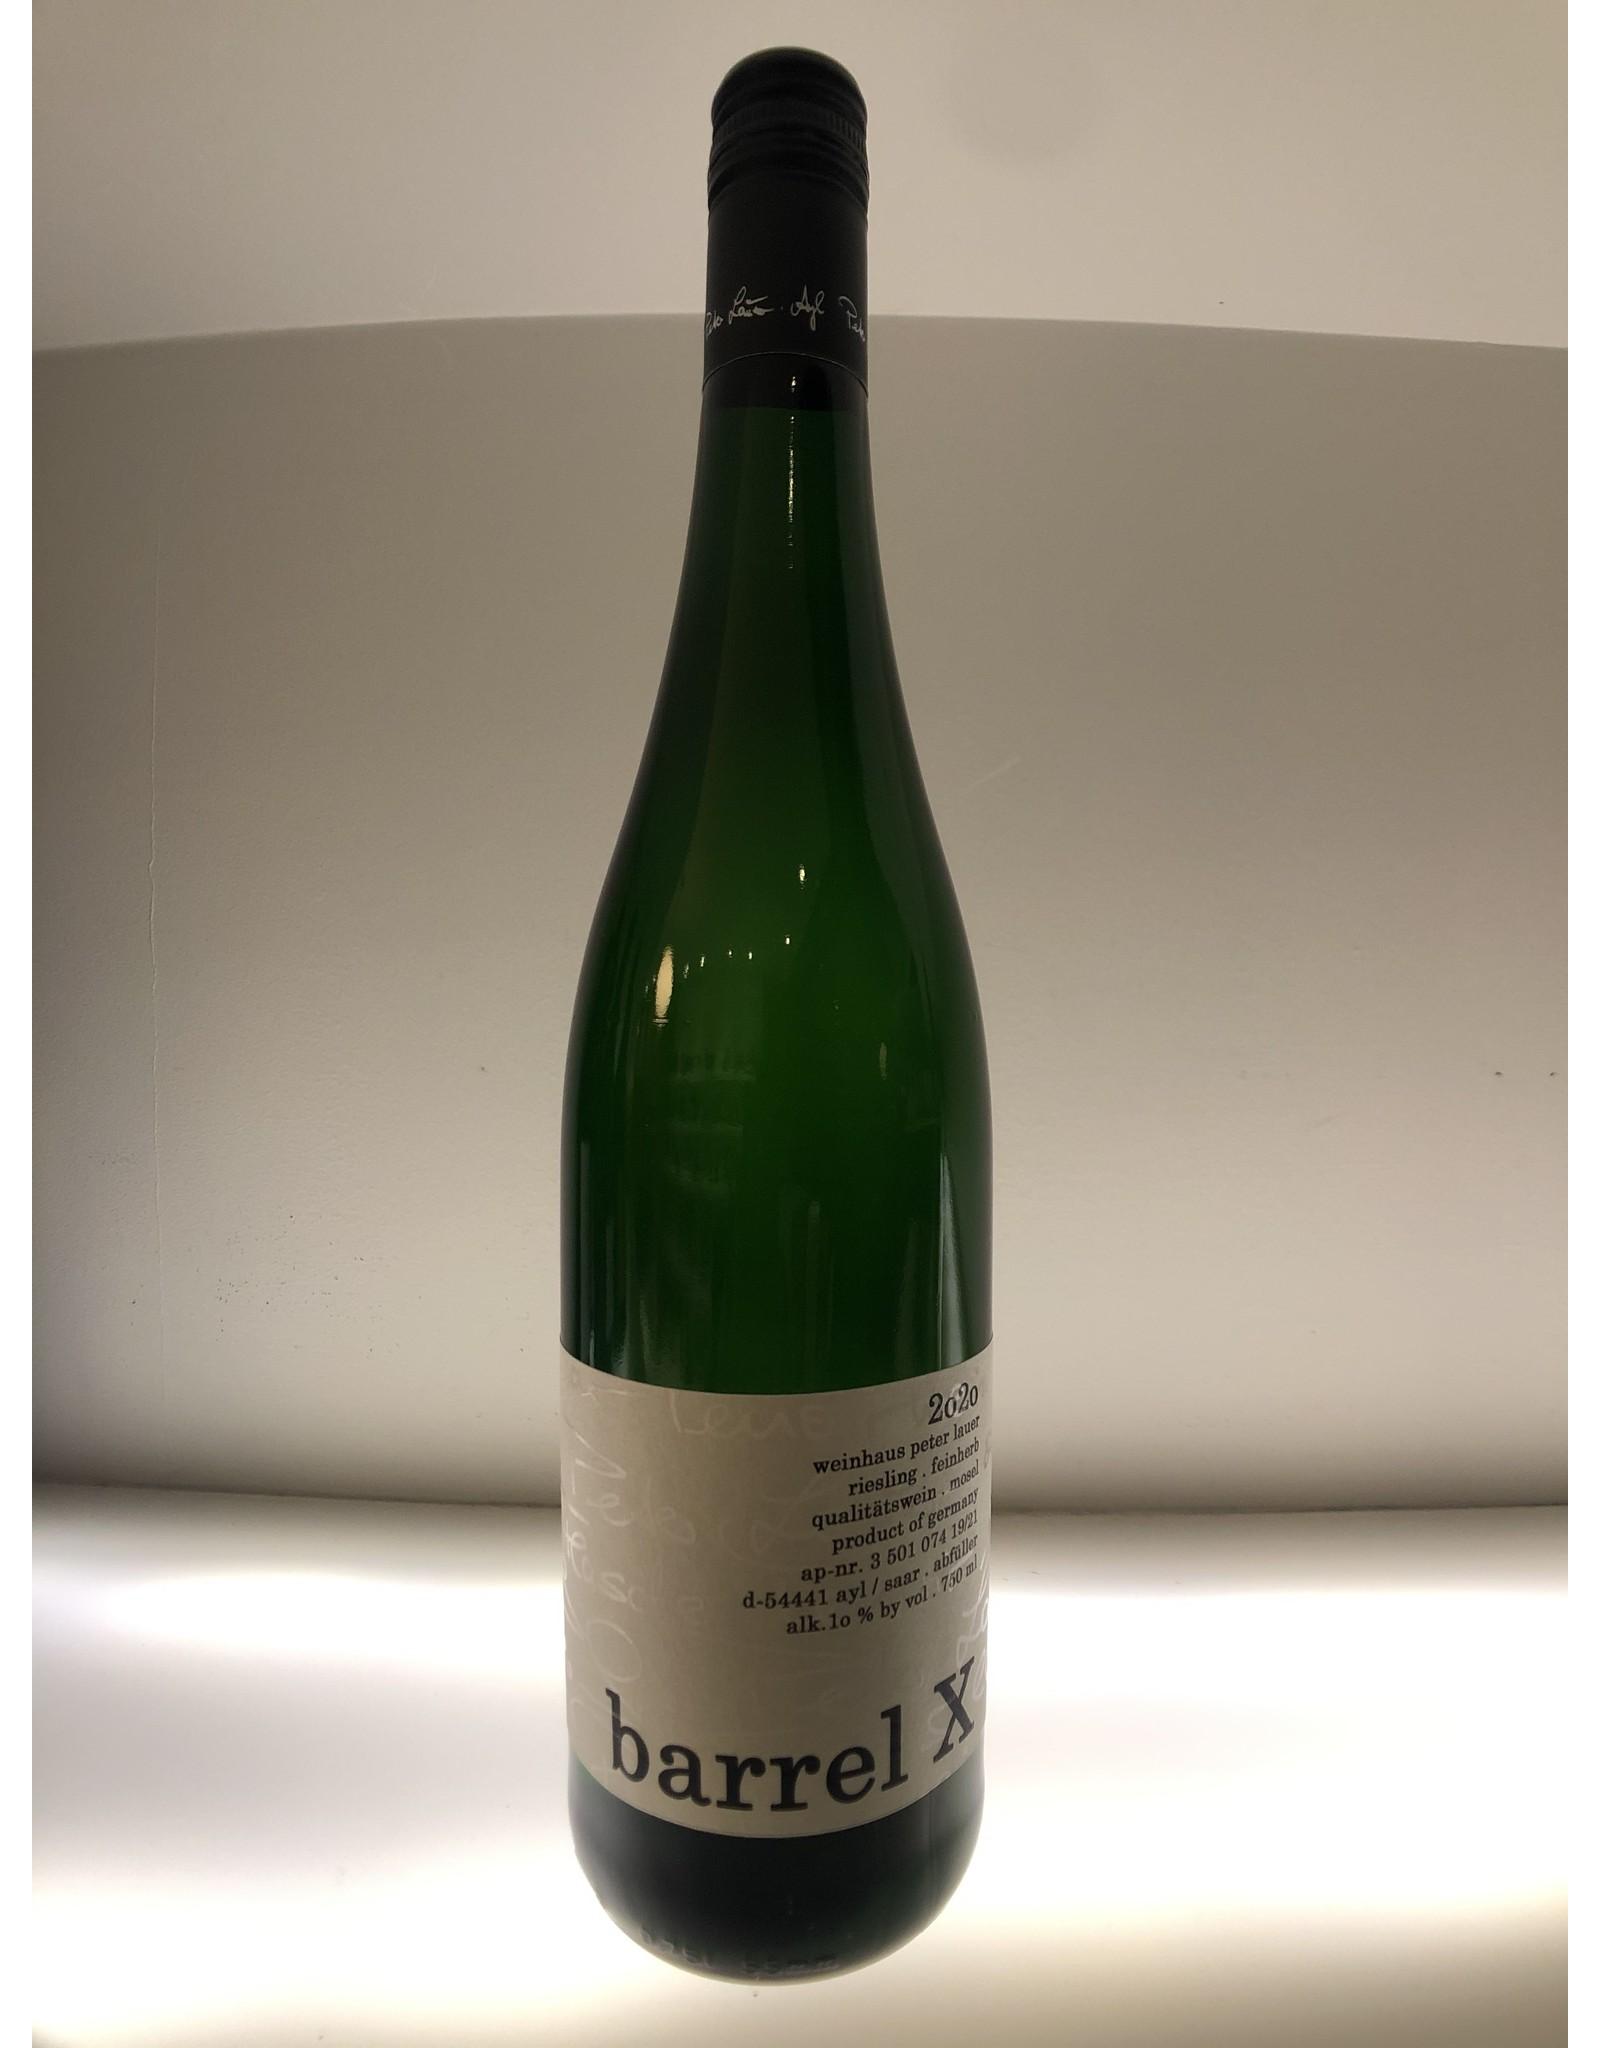 Lauer Lauer, Barrel X, Riesling Feinherb 2020 Mosel, Germany (750mL)